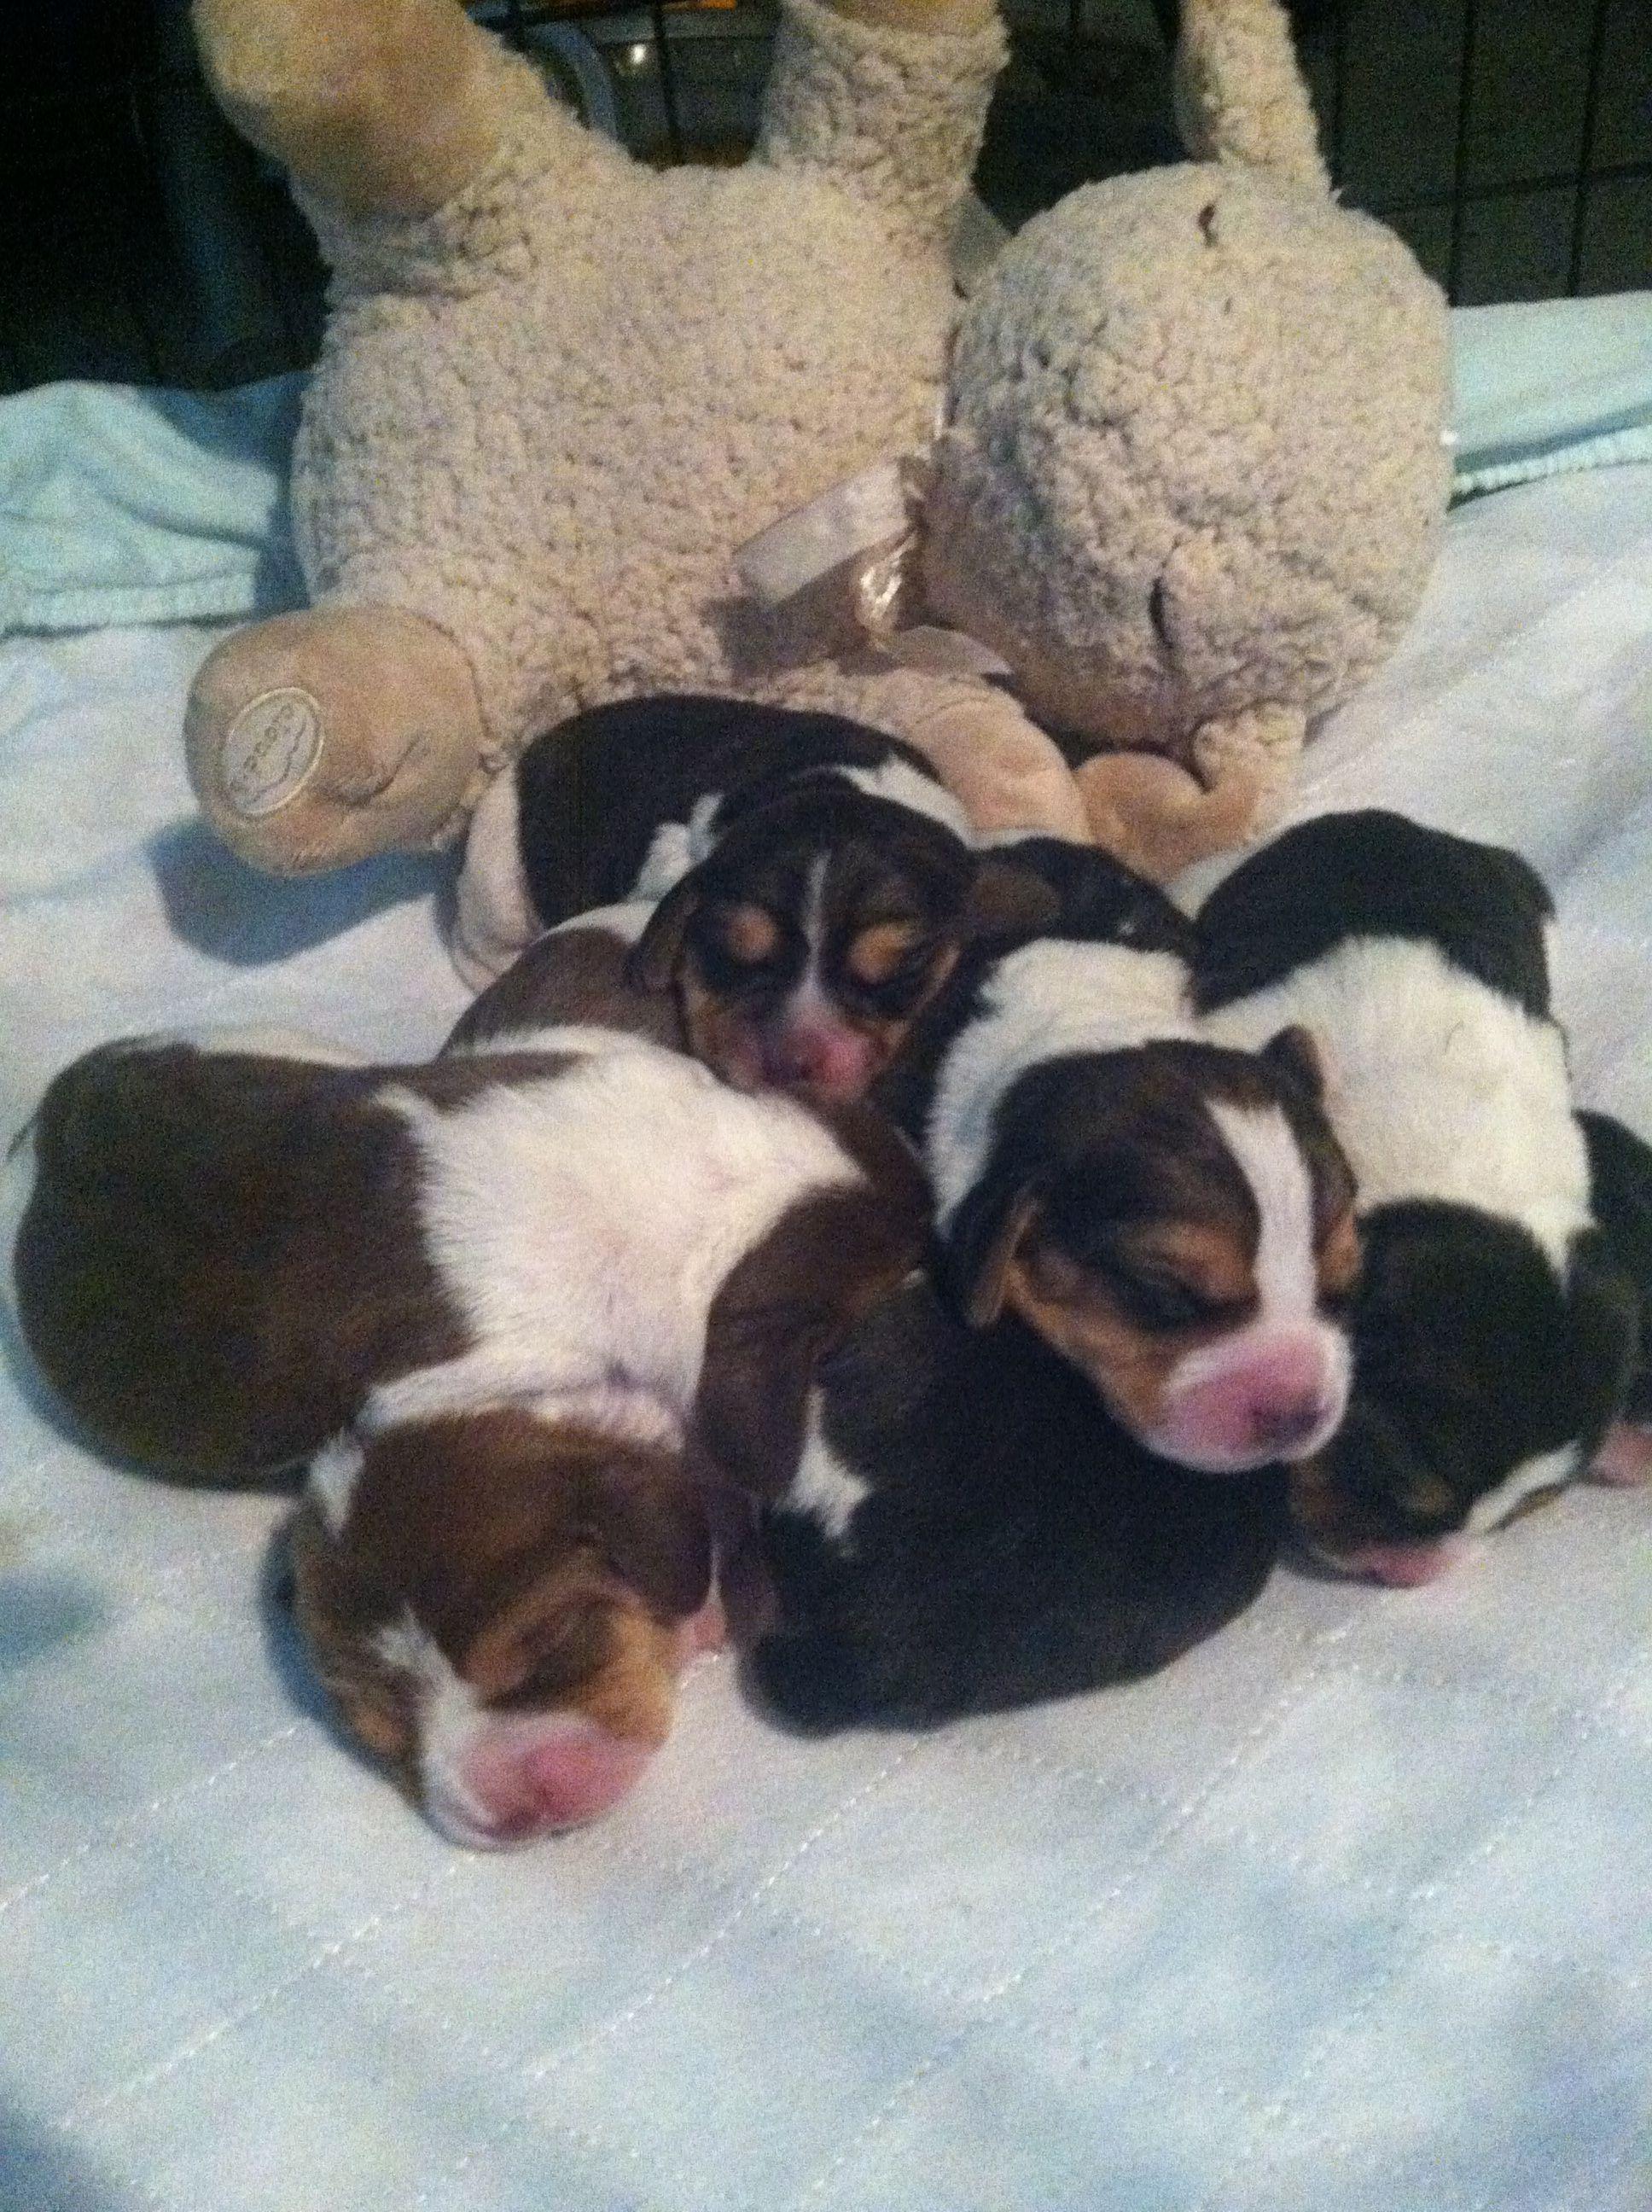 Newborn Beagle Puppies So Cute Beagle Puppy Beagle Buddies